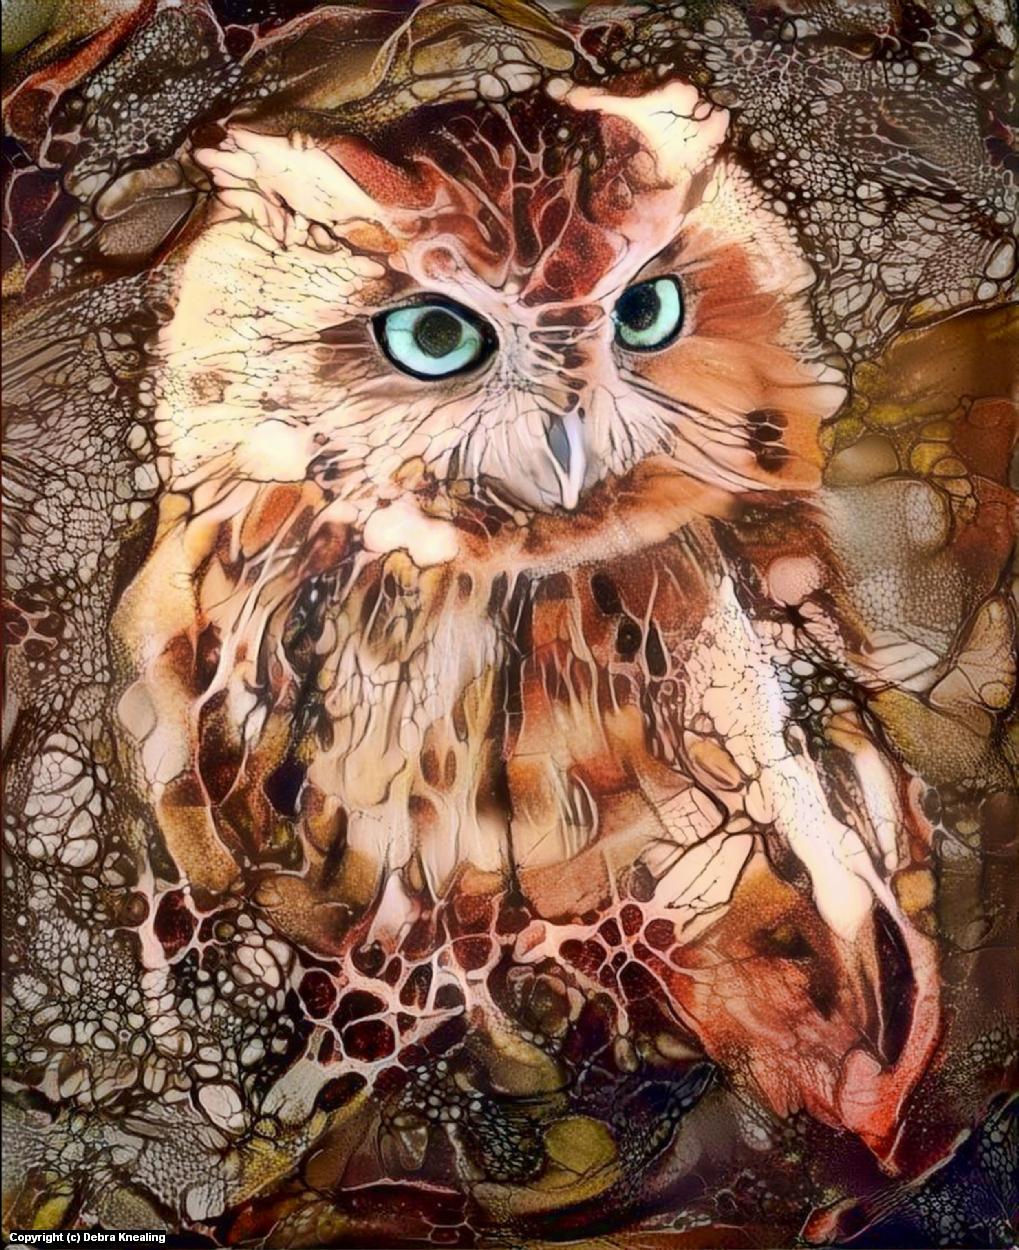 Howl Artwork by Debra Knealing